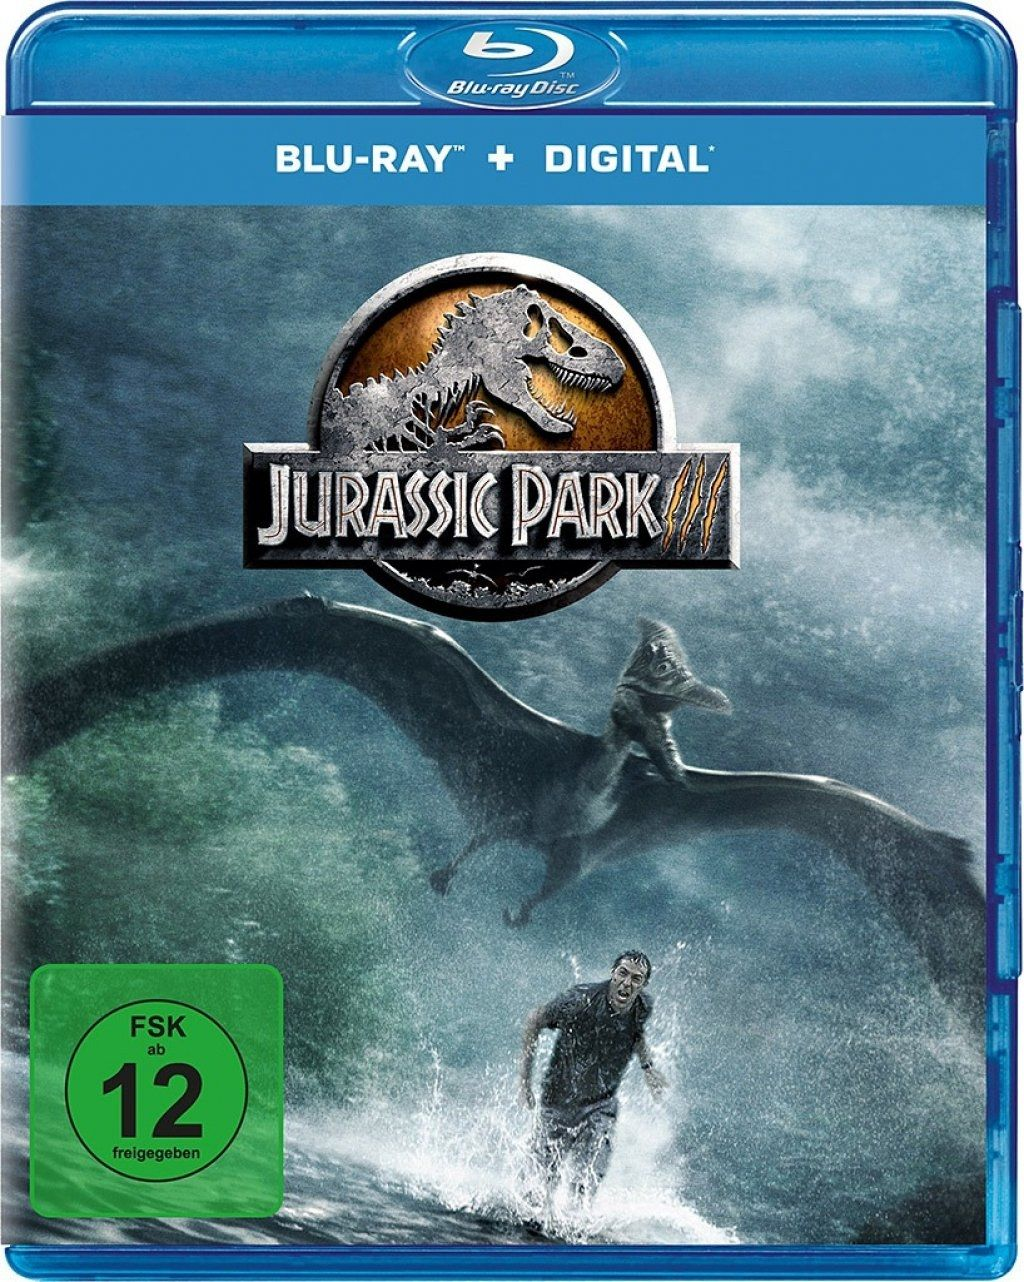 Jurassic Park 3 (Neuauflage) (BLURAY)